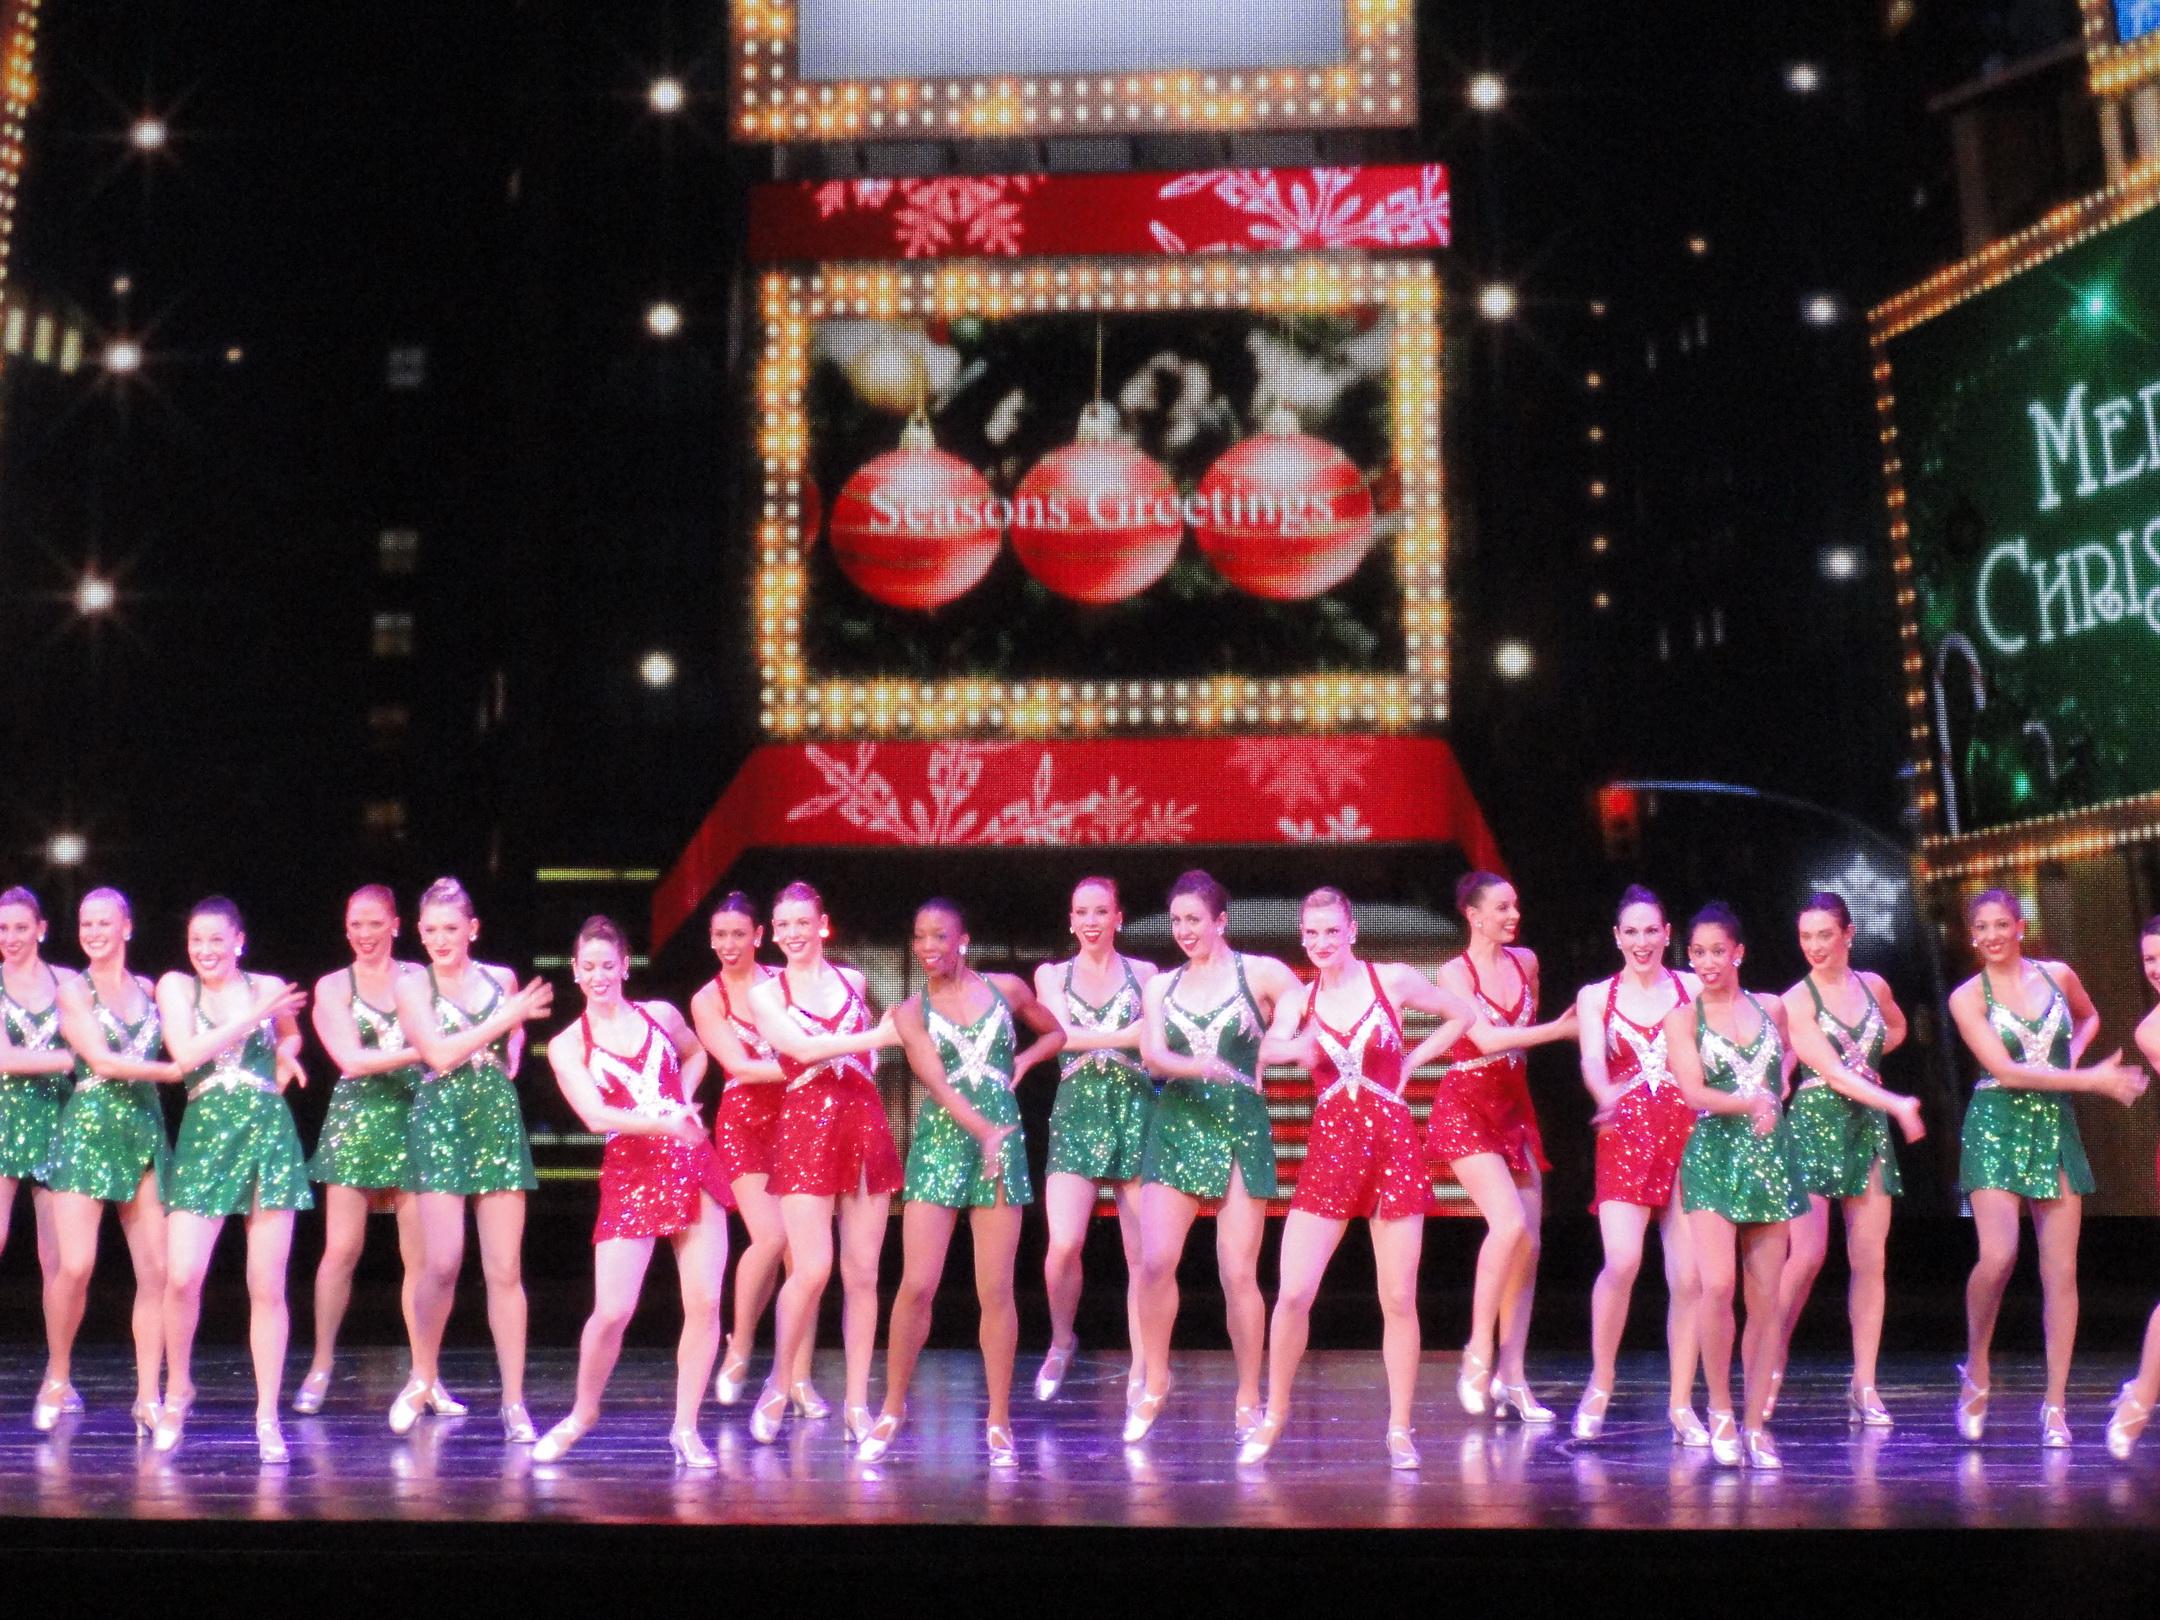 christmas-costumes-02069